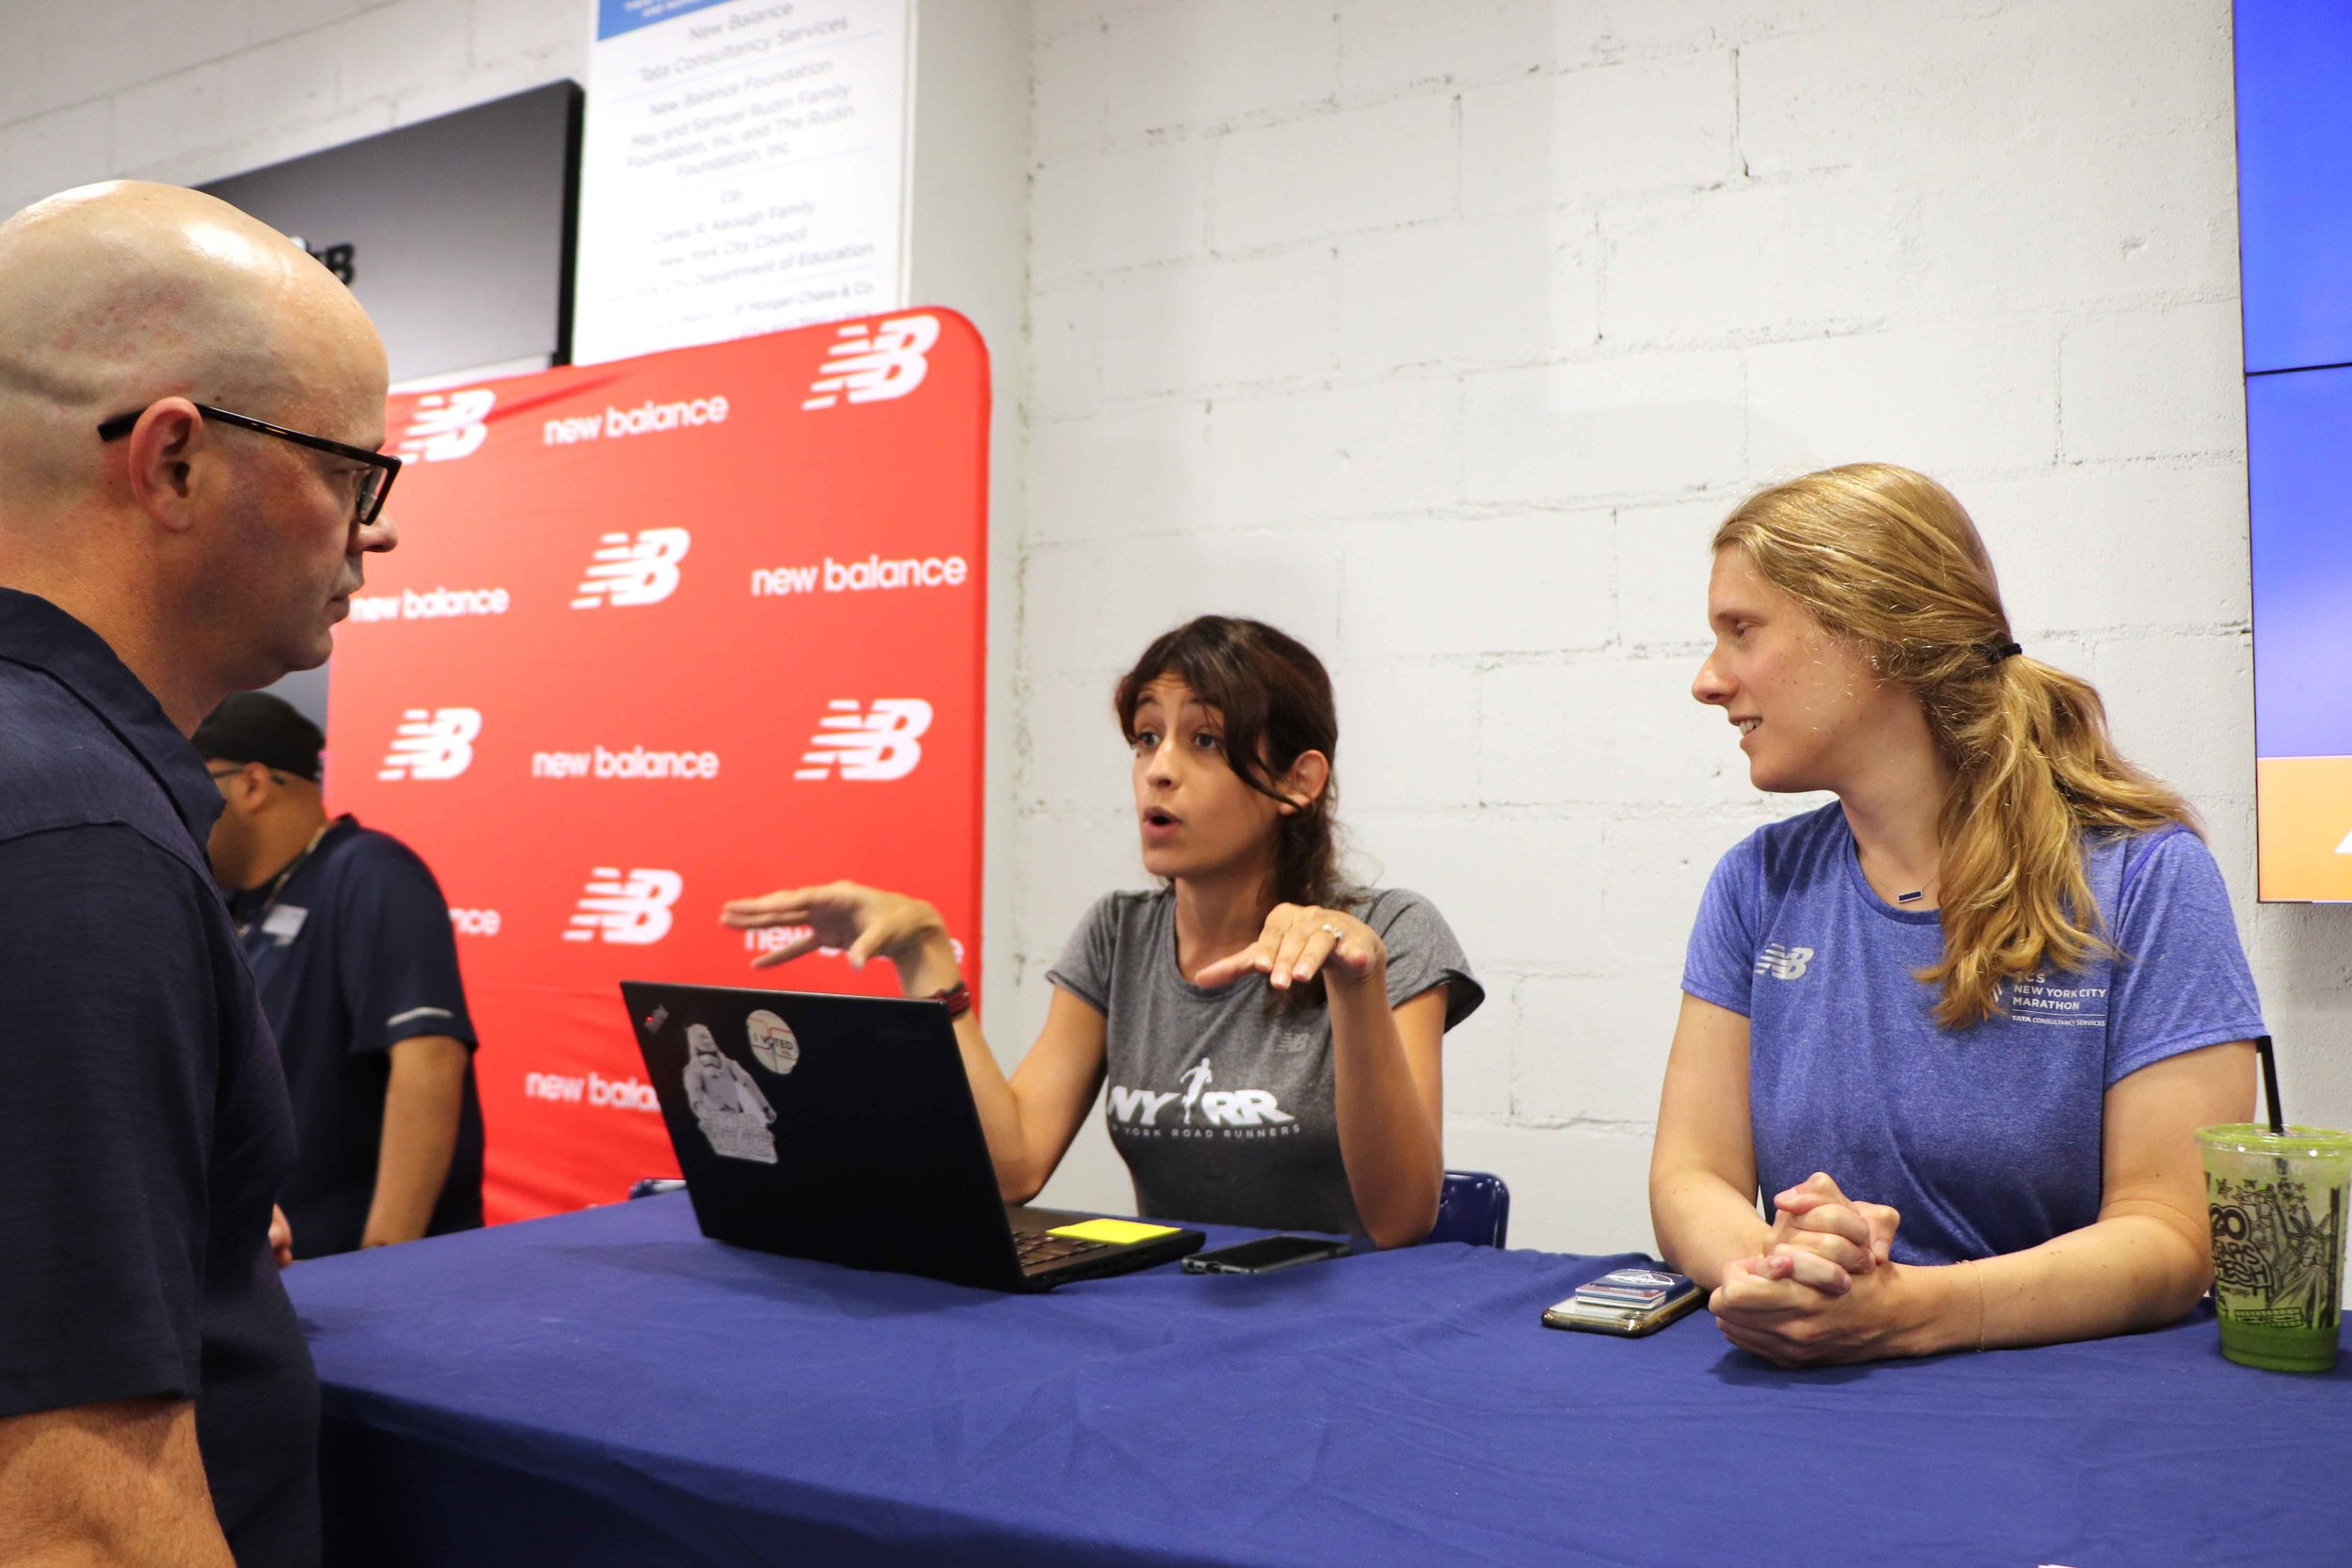 NYRR Virtual Training coach Tammy Salazar, left, at the TCS New York City Marathon Training Expo, discussing the TCS New York City Marathon Virtual Training Program.